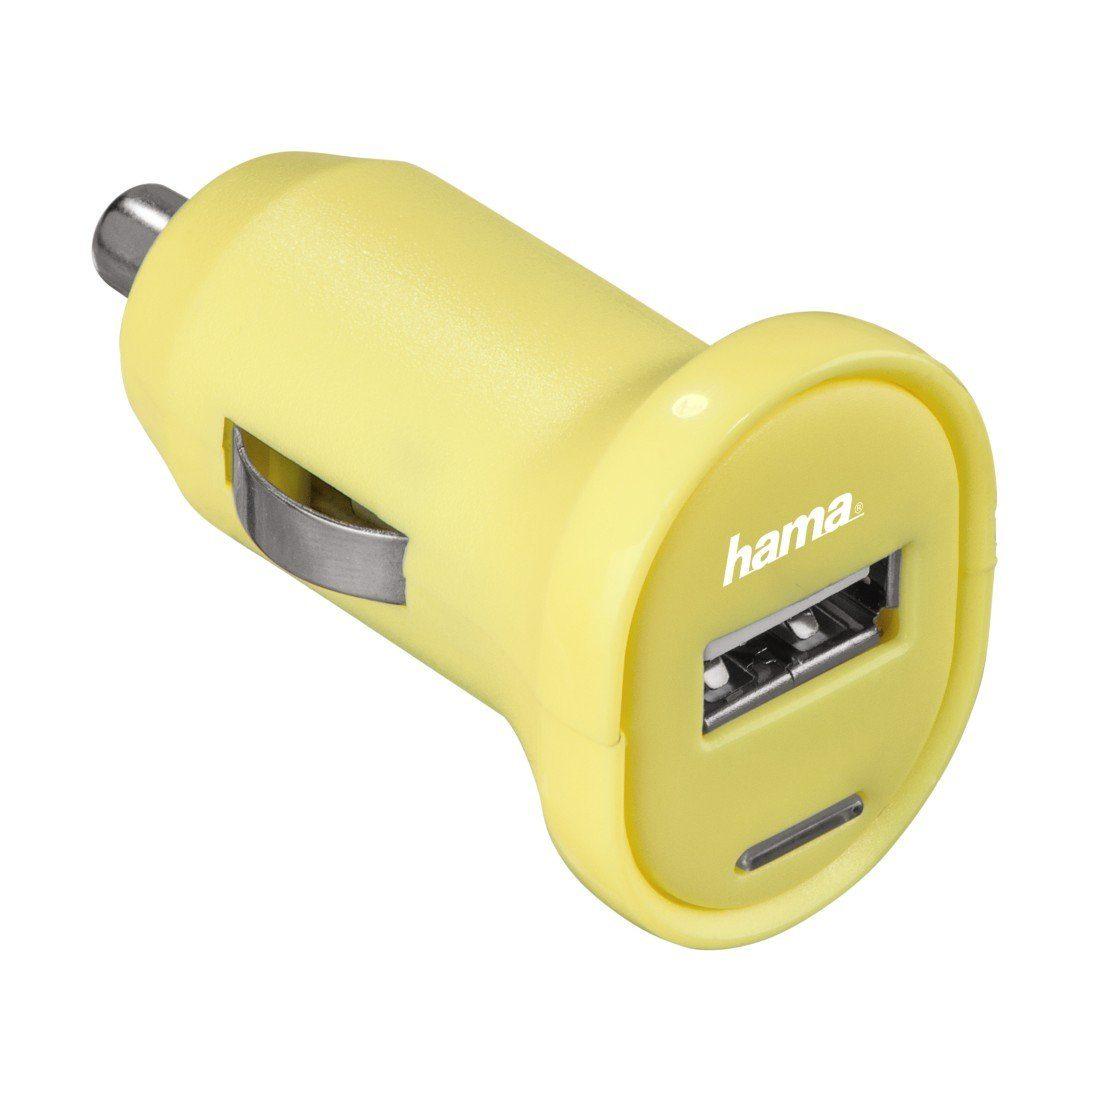 Hama USB-Ladegerät Picco, 12 V, 1 A, Gelb